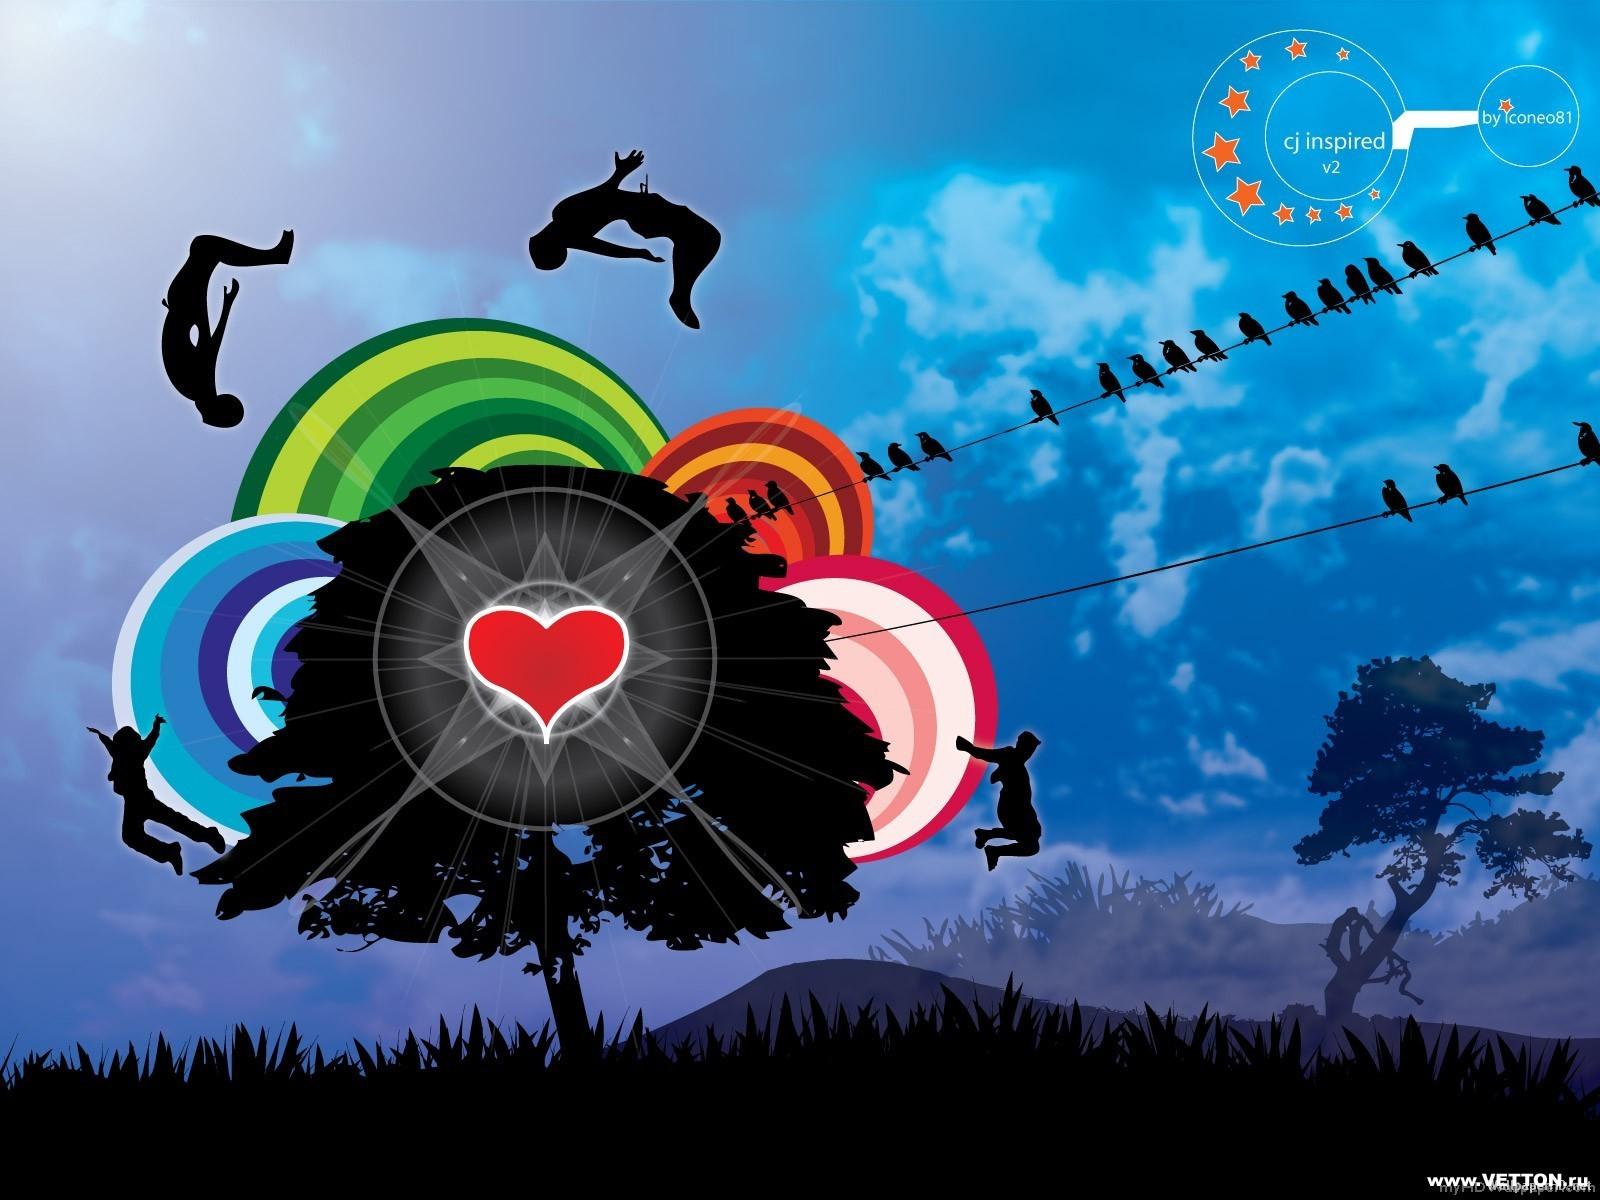 http://3.bp.blogspot.com/-Oqnuw0d7bUQ/URy4kU8WuTI/AAAAAAAAB24/kbOG2Jvys-k/s1600/creative-wallpaper-designs.jpg